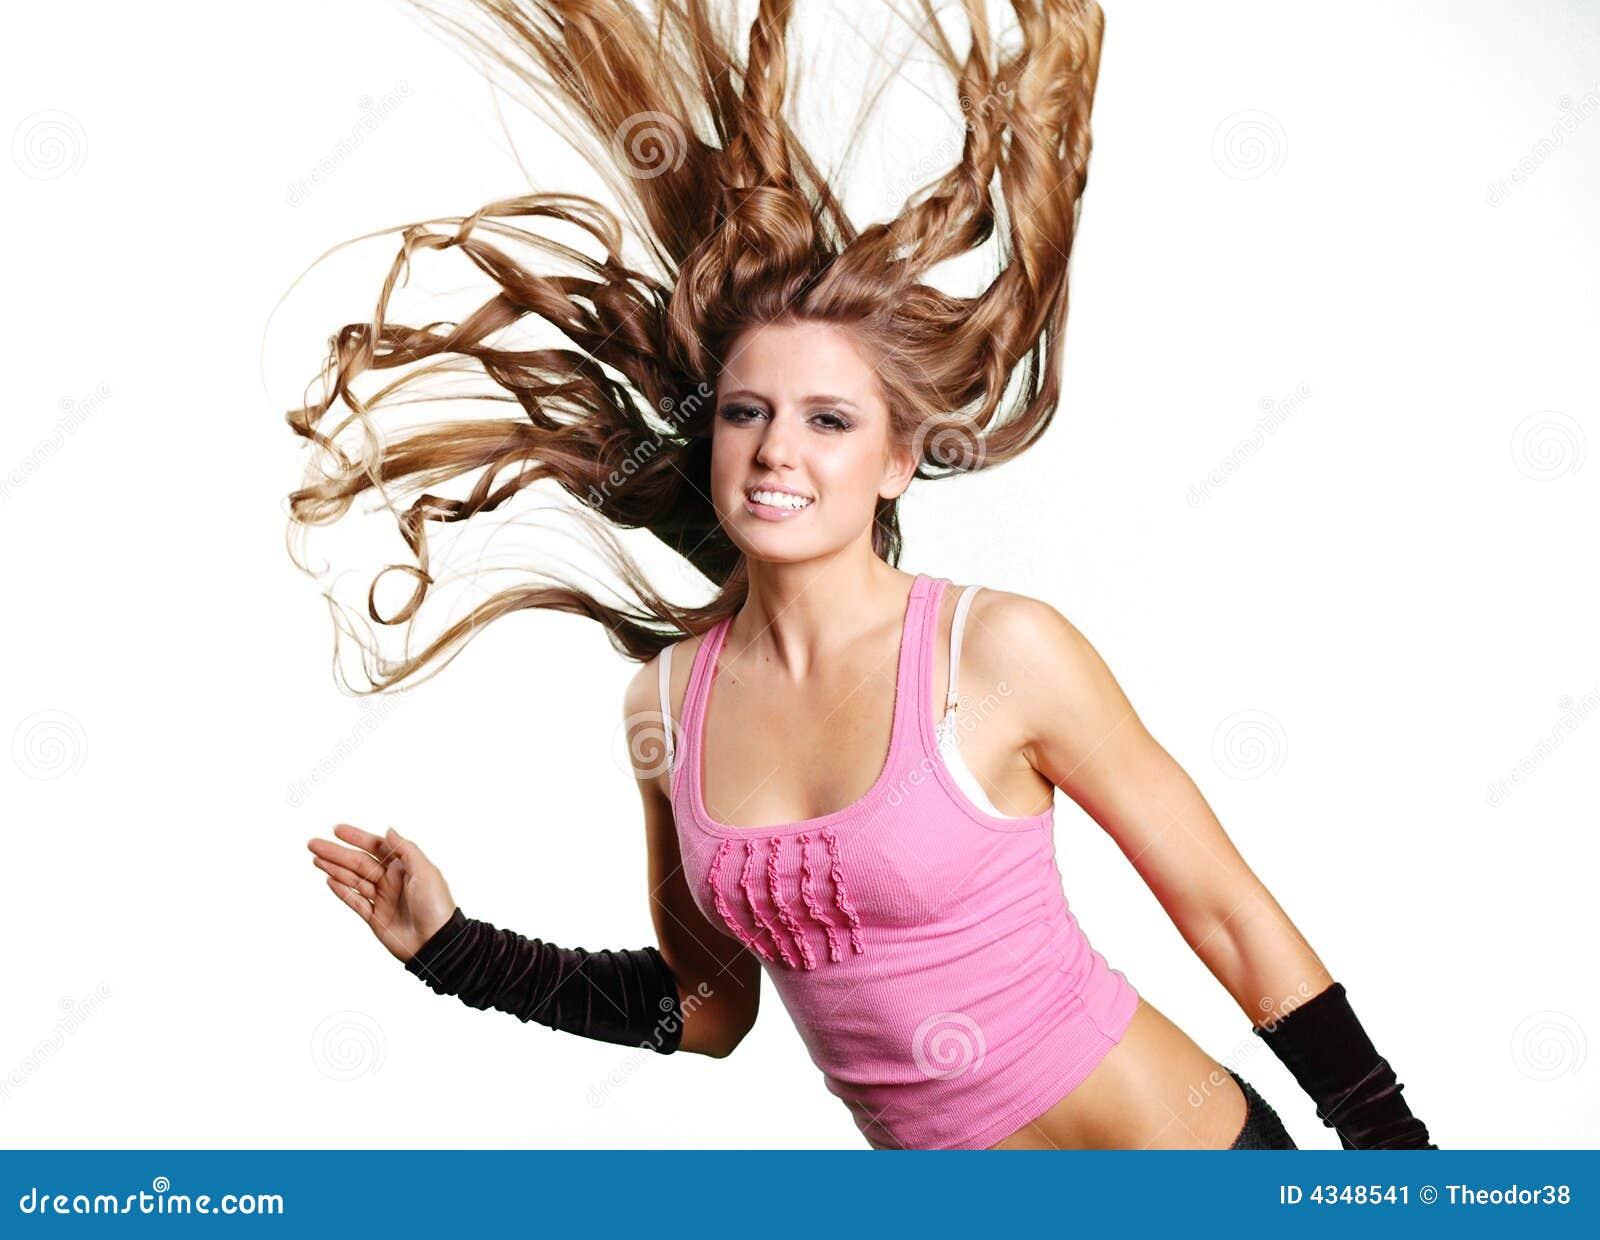 photo sexy dancer girl flipping hair